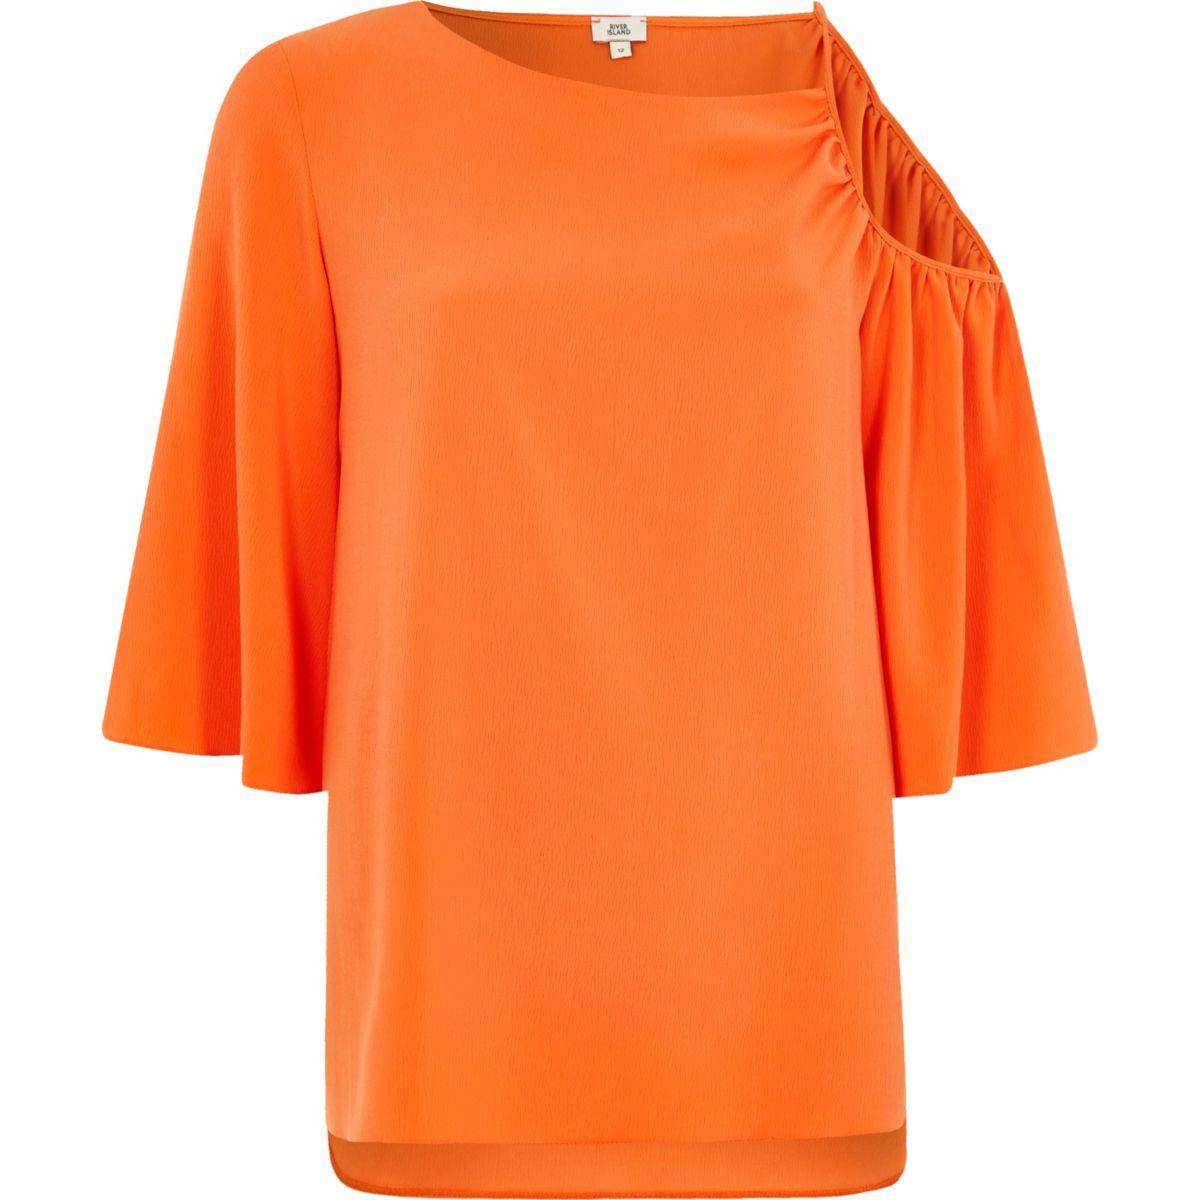 Orange asymmetric cold shoulder top